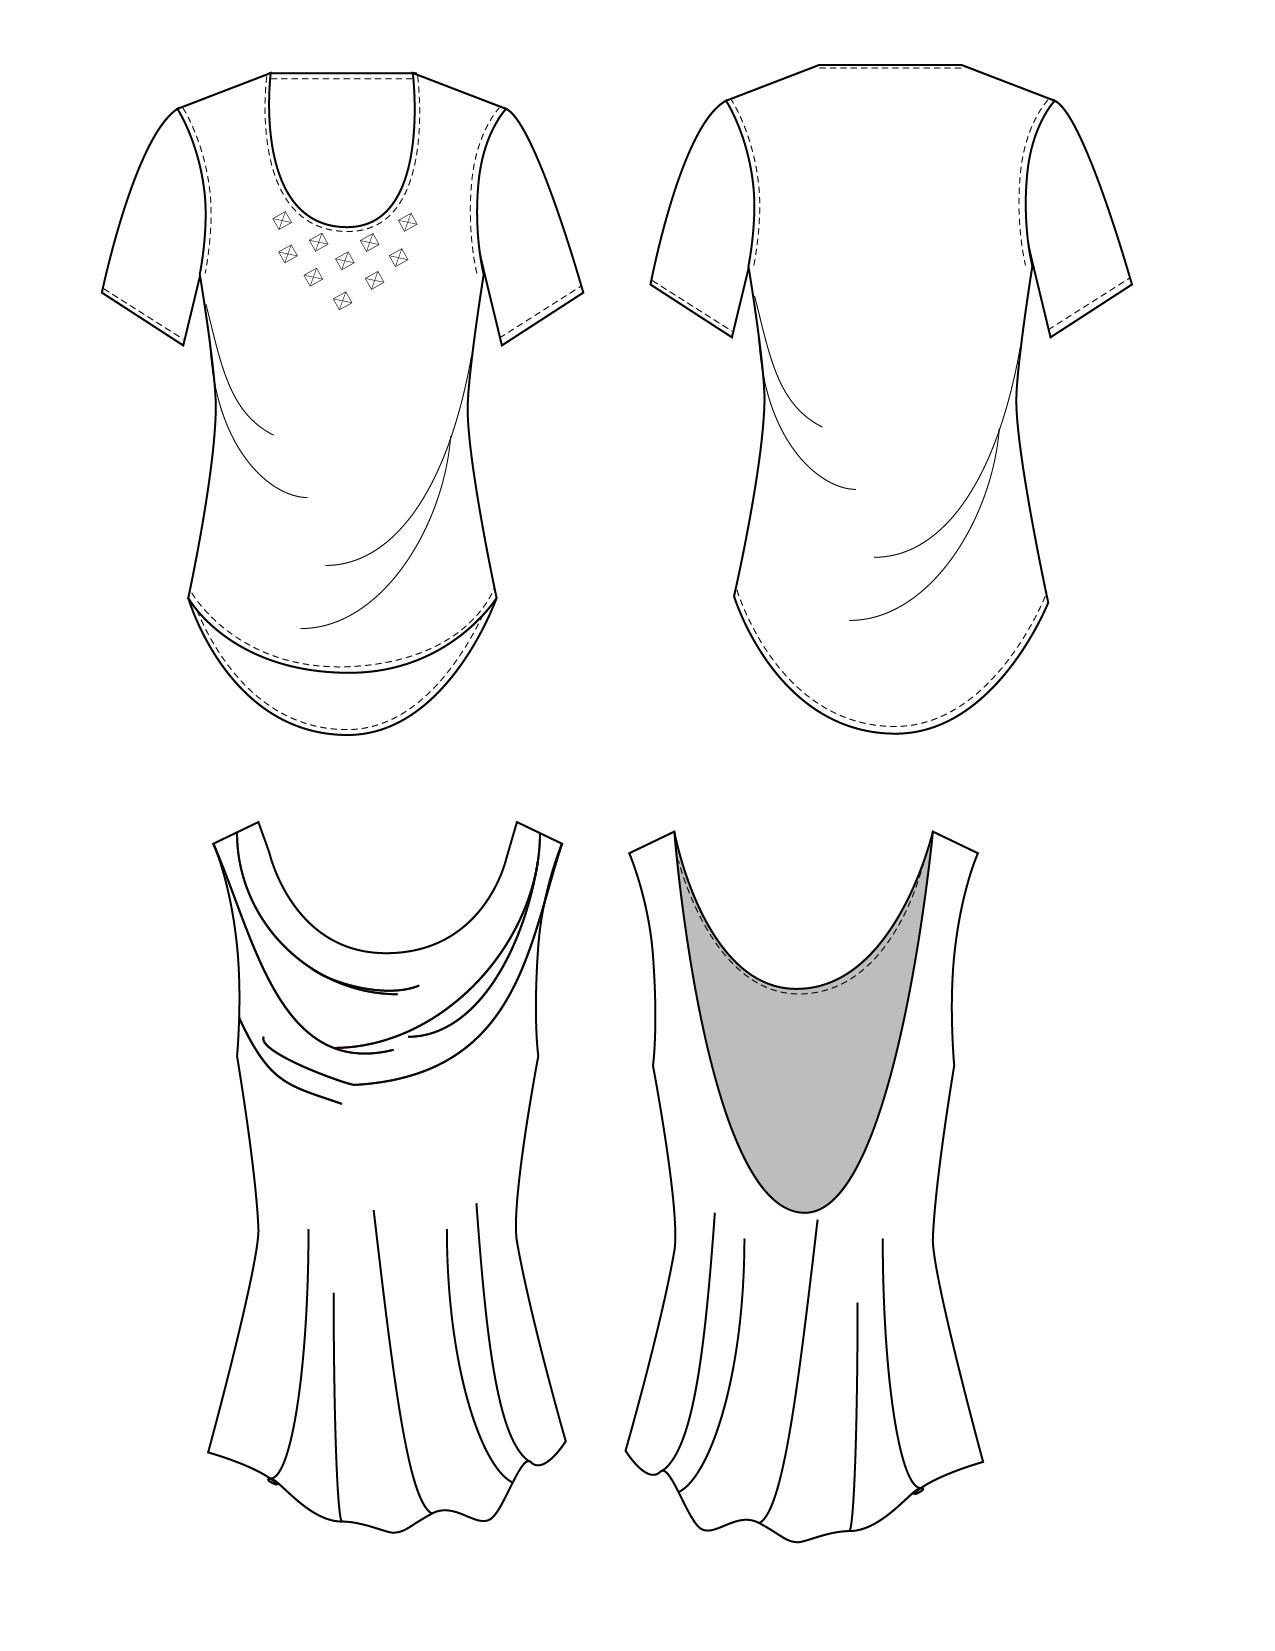 fashion-illustrations-10.jpg